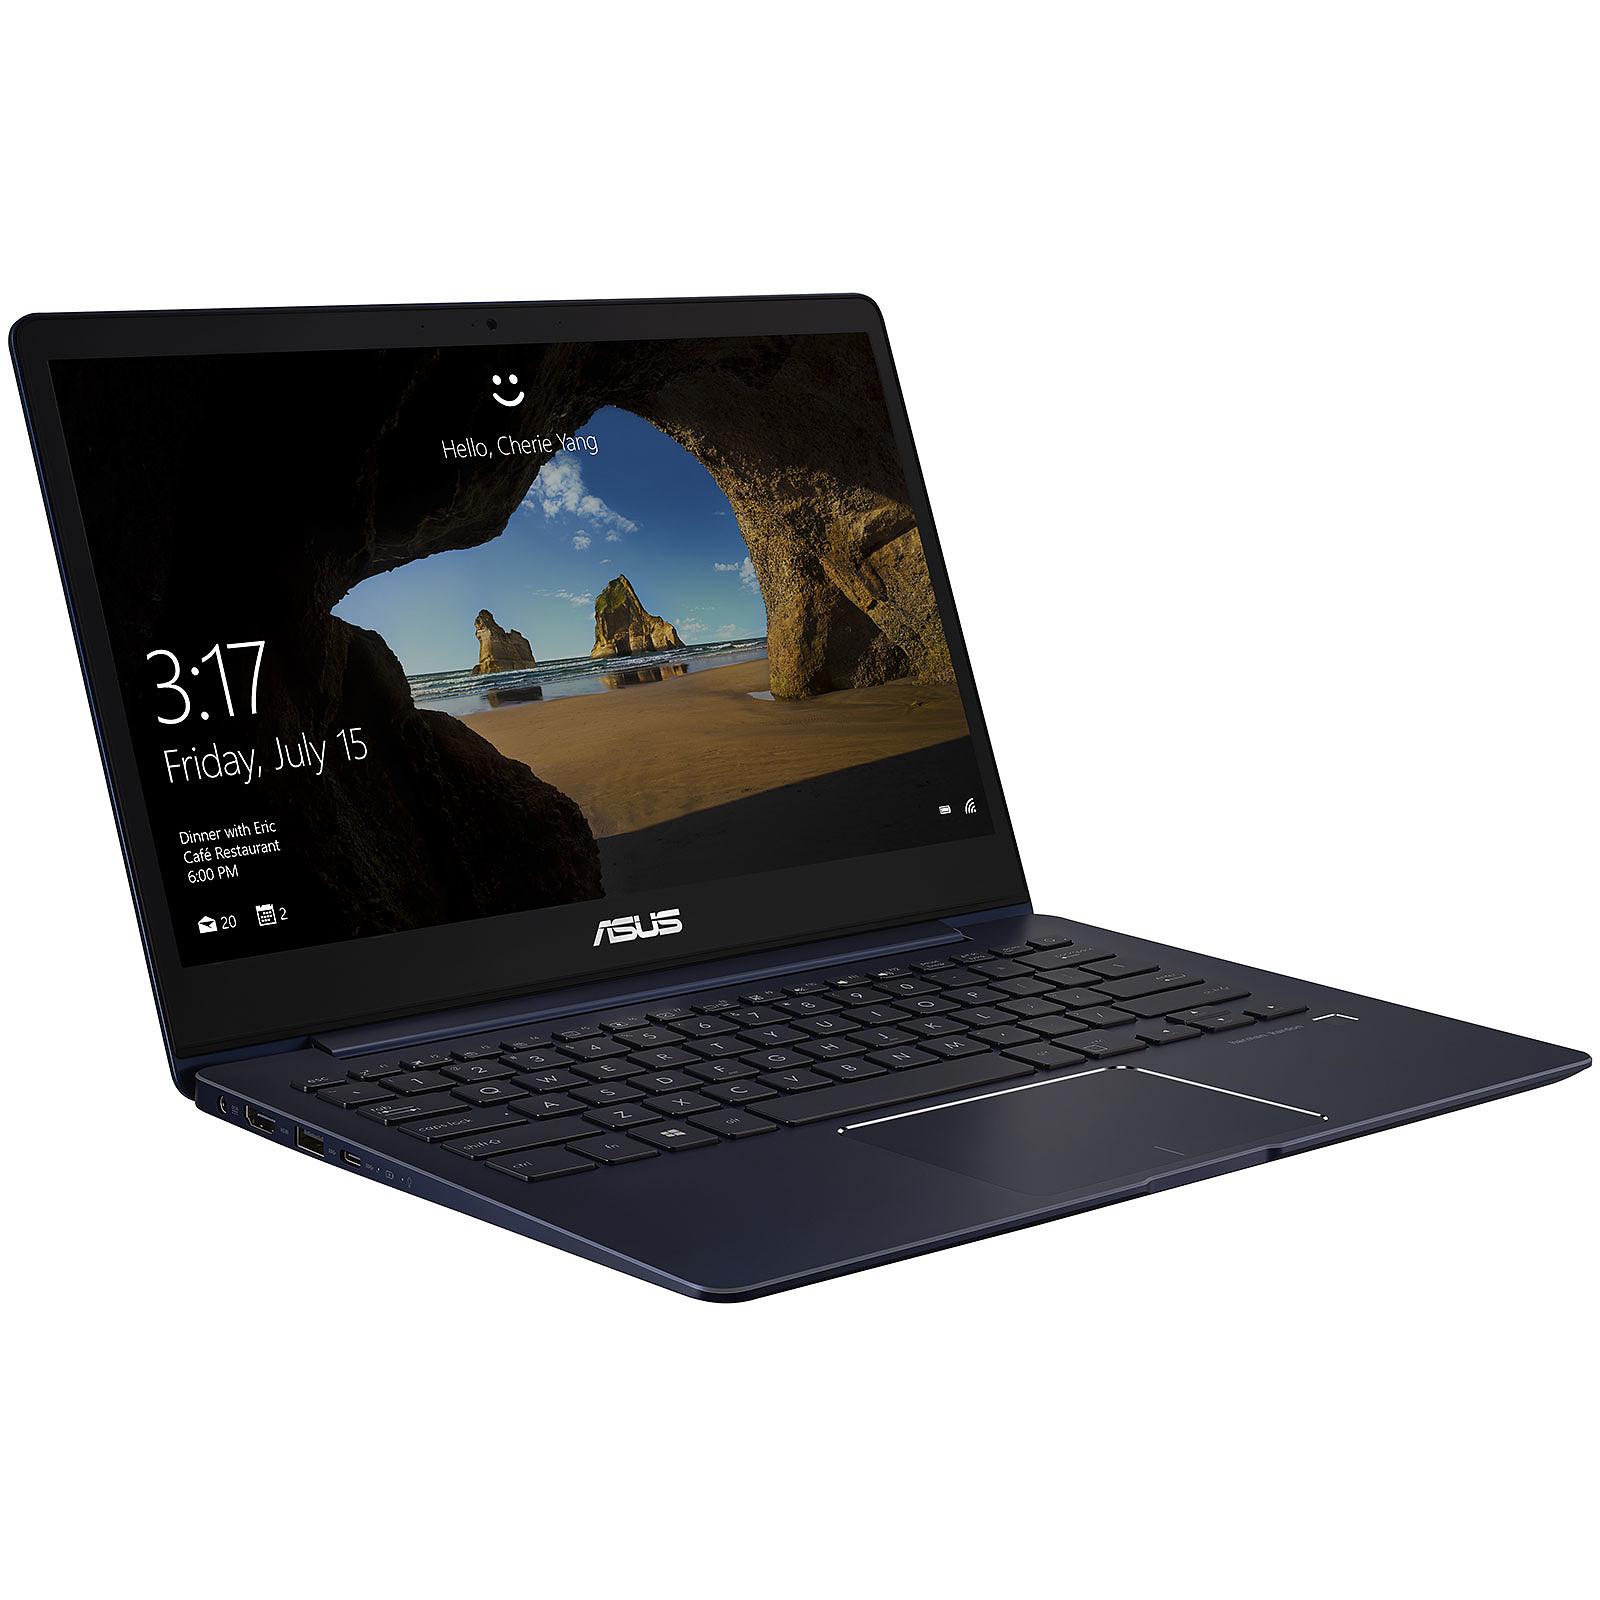 ASUS Zenbook 13 UX331UN-EG037T